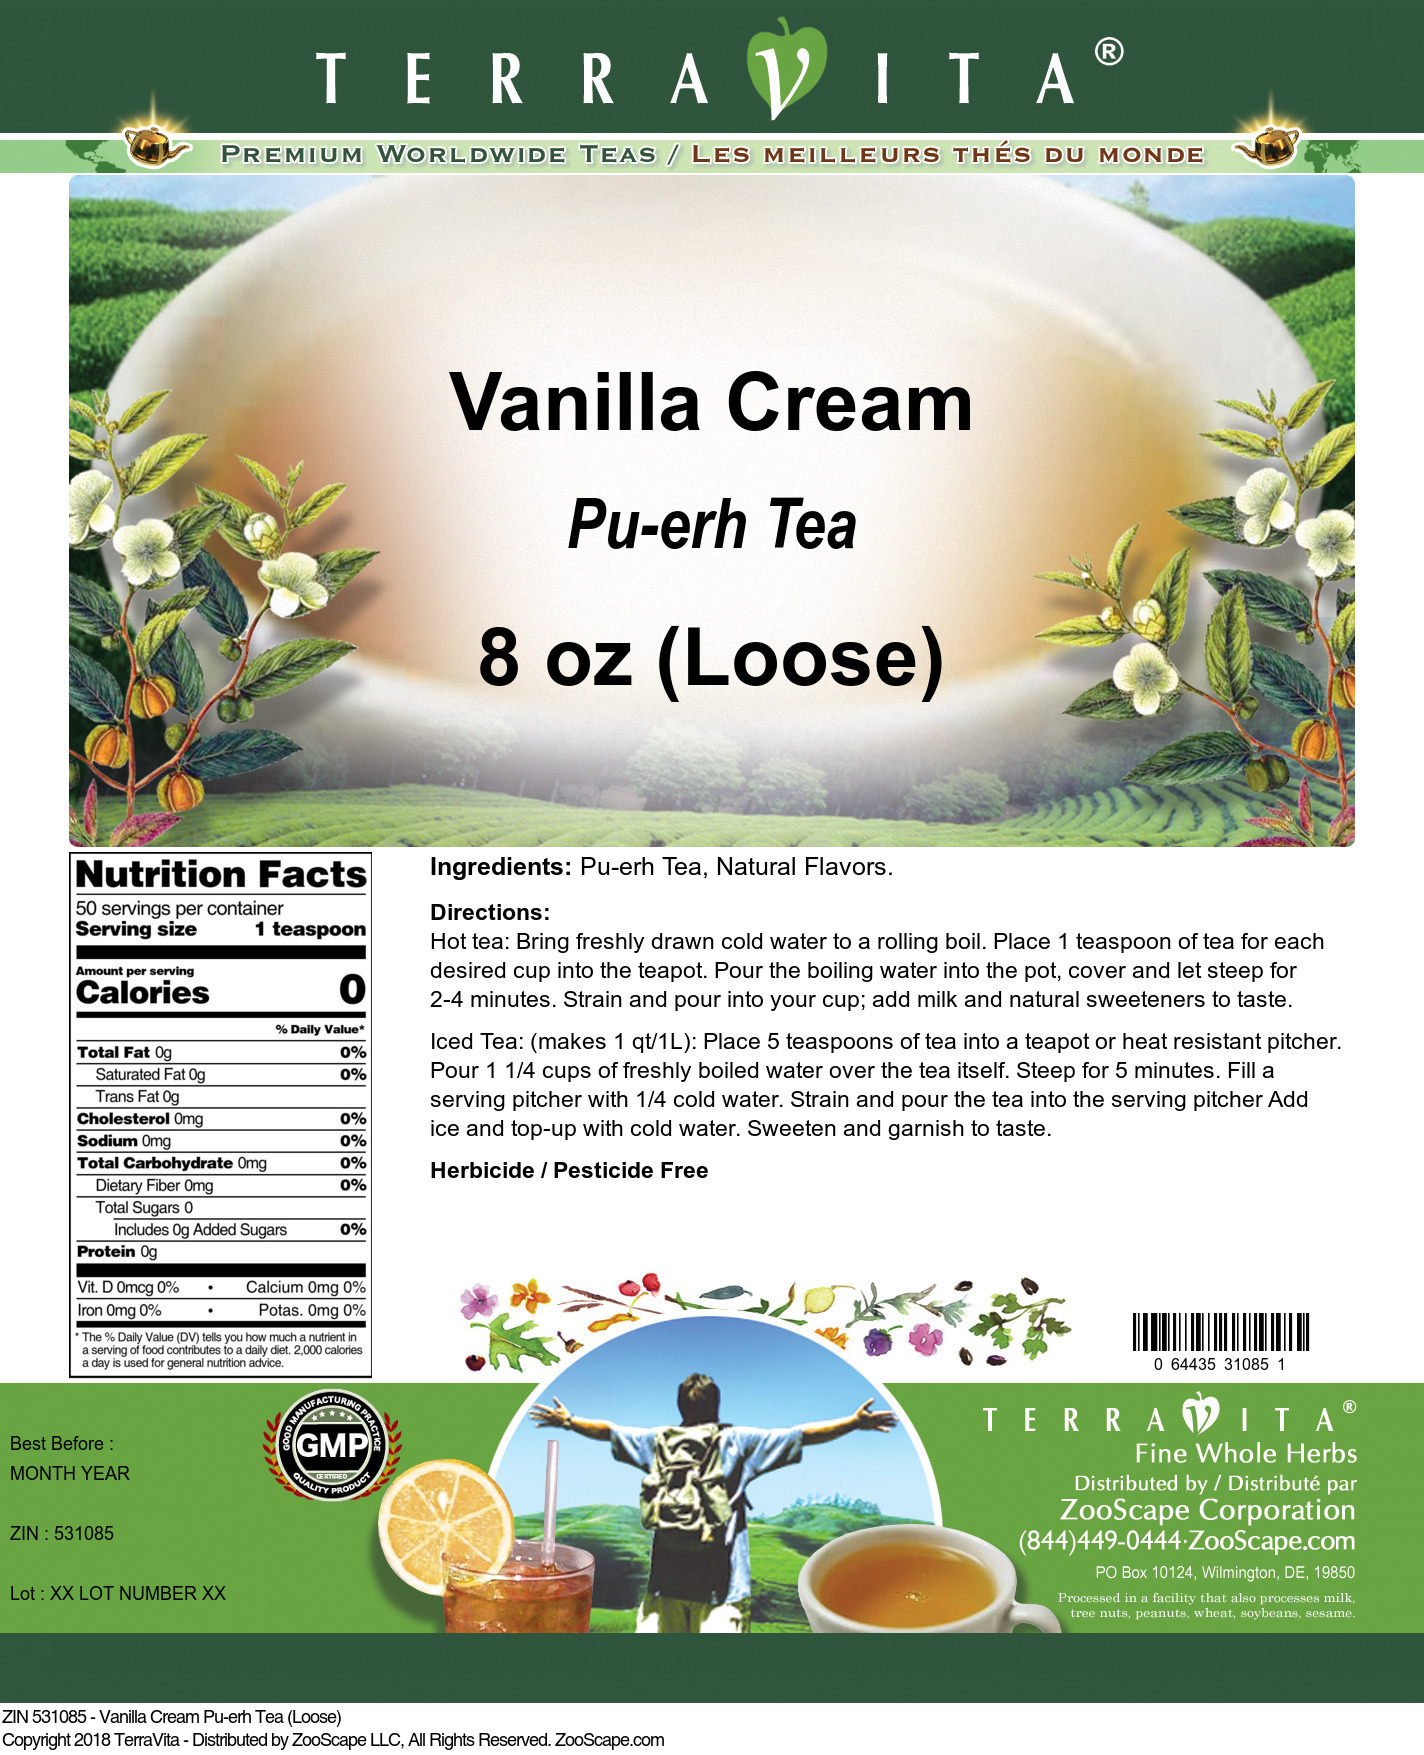 Vanilla Cream Pu-erh Tea (Loose)